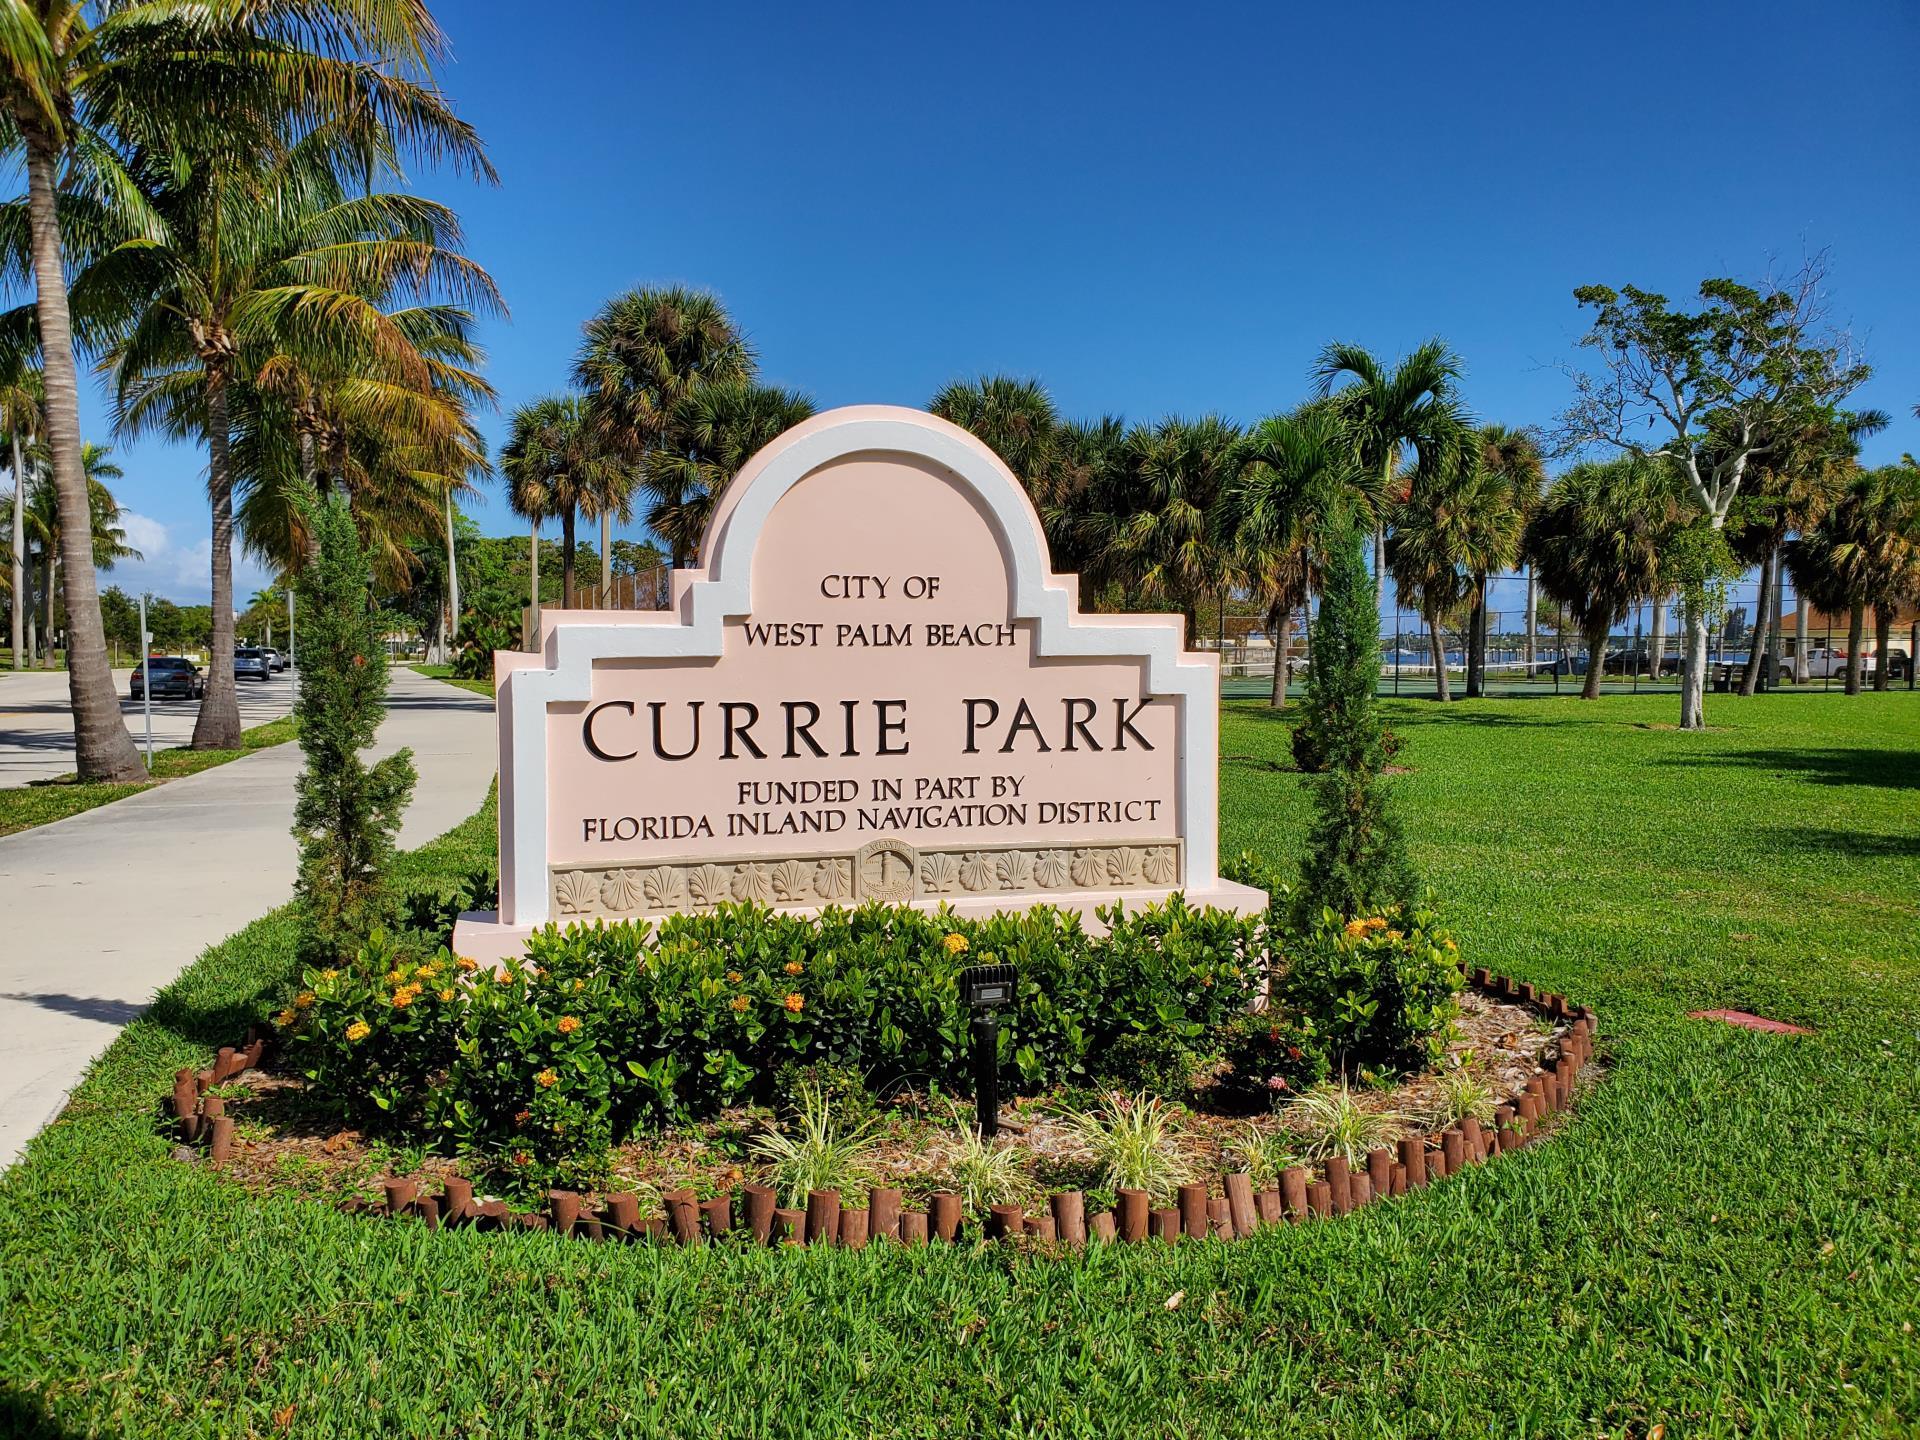 Currie Park Entrance